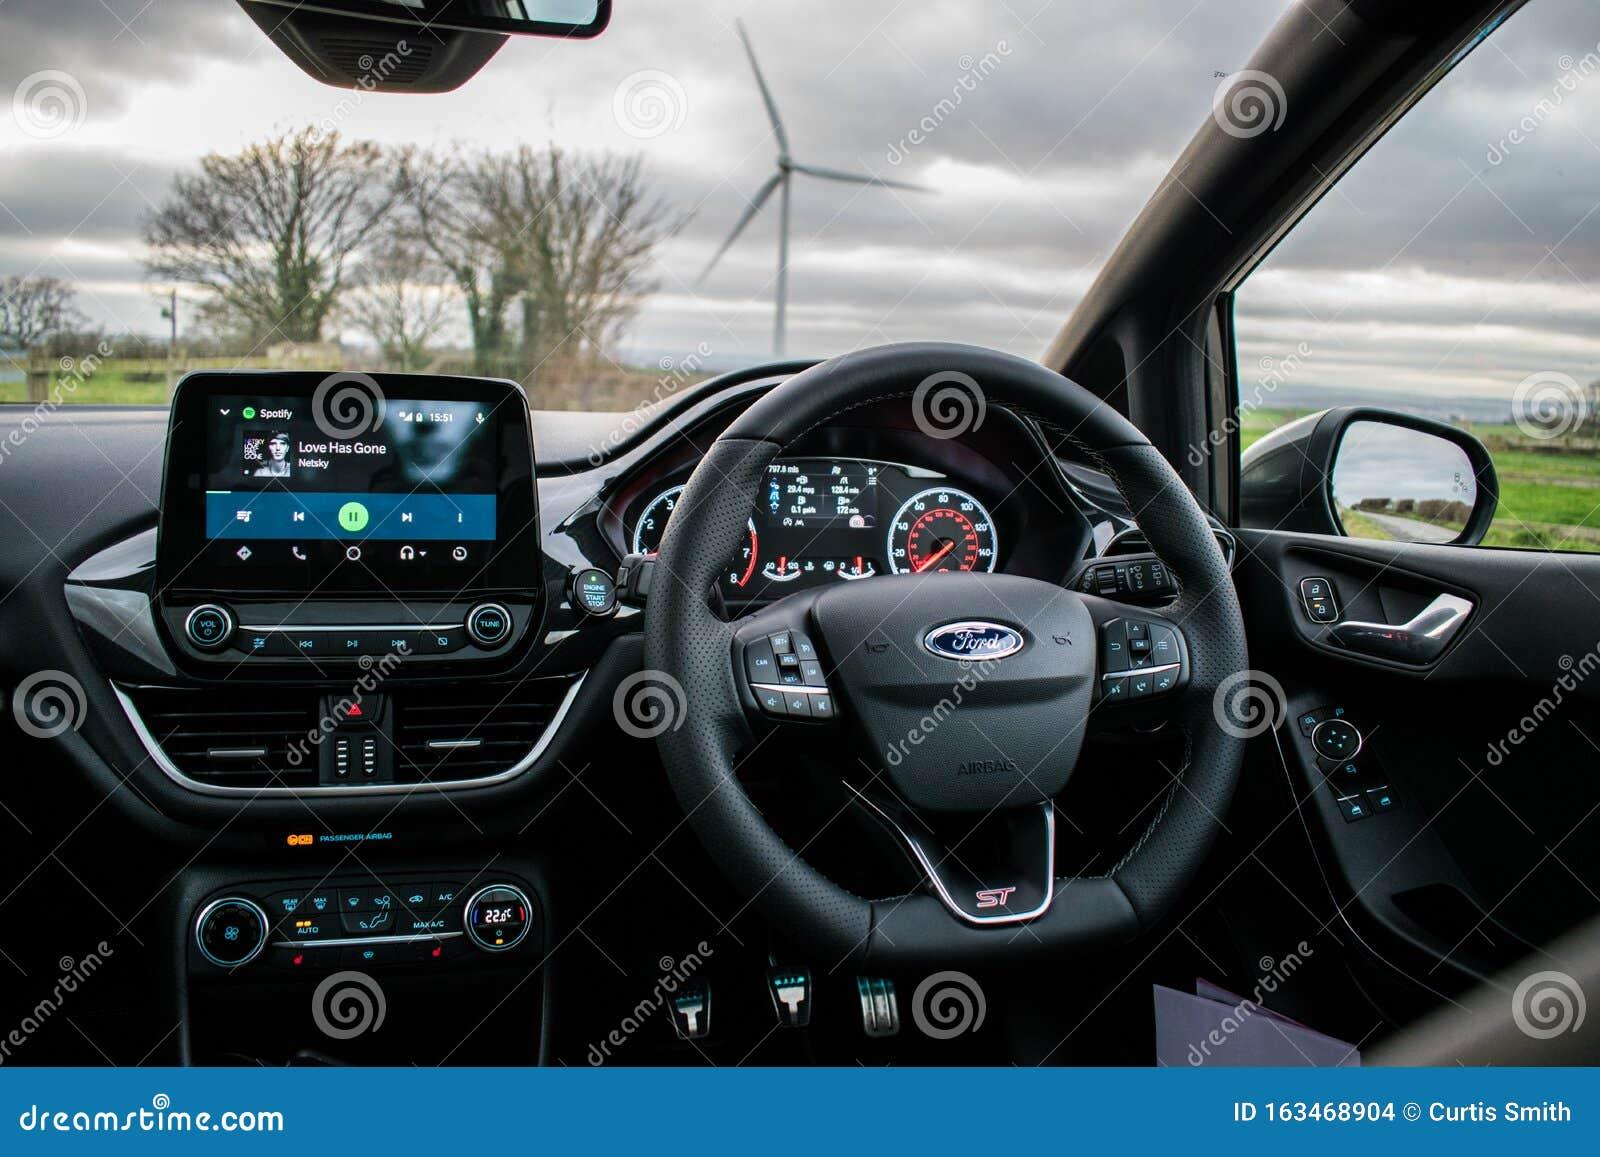 Mk8 Ford Fiesta St Interior Imagem De Stock Editorial Imagem De Ostentar Tiro 163468904